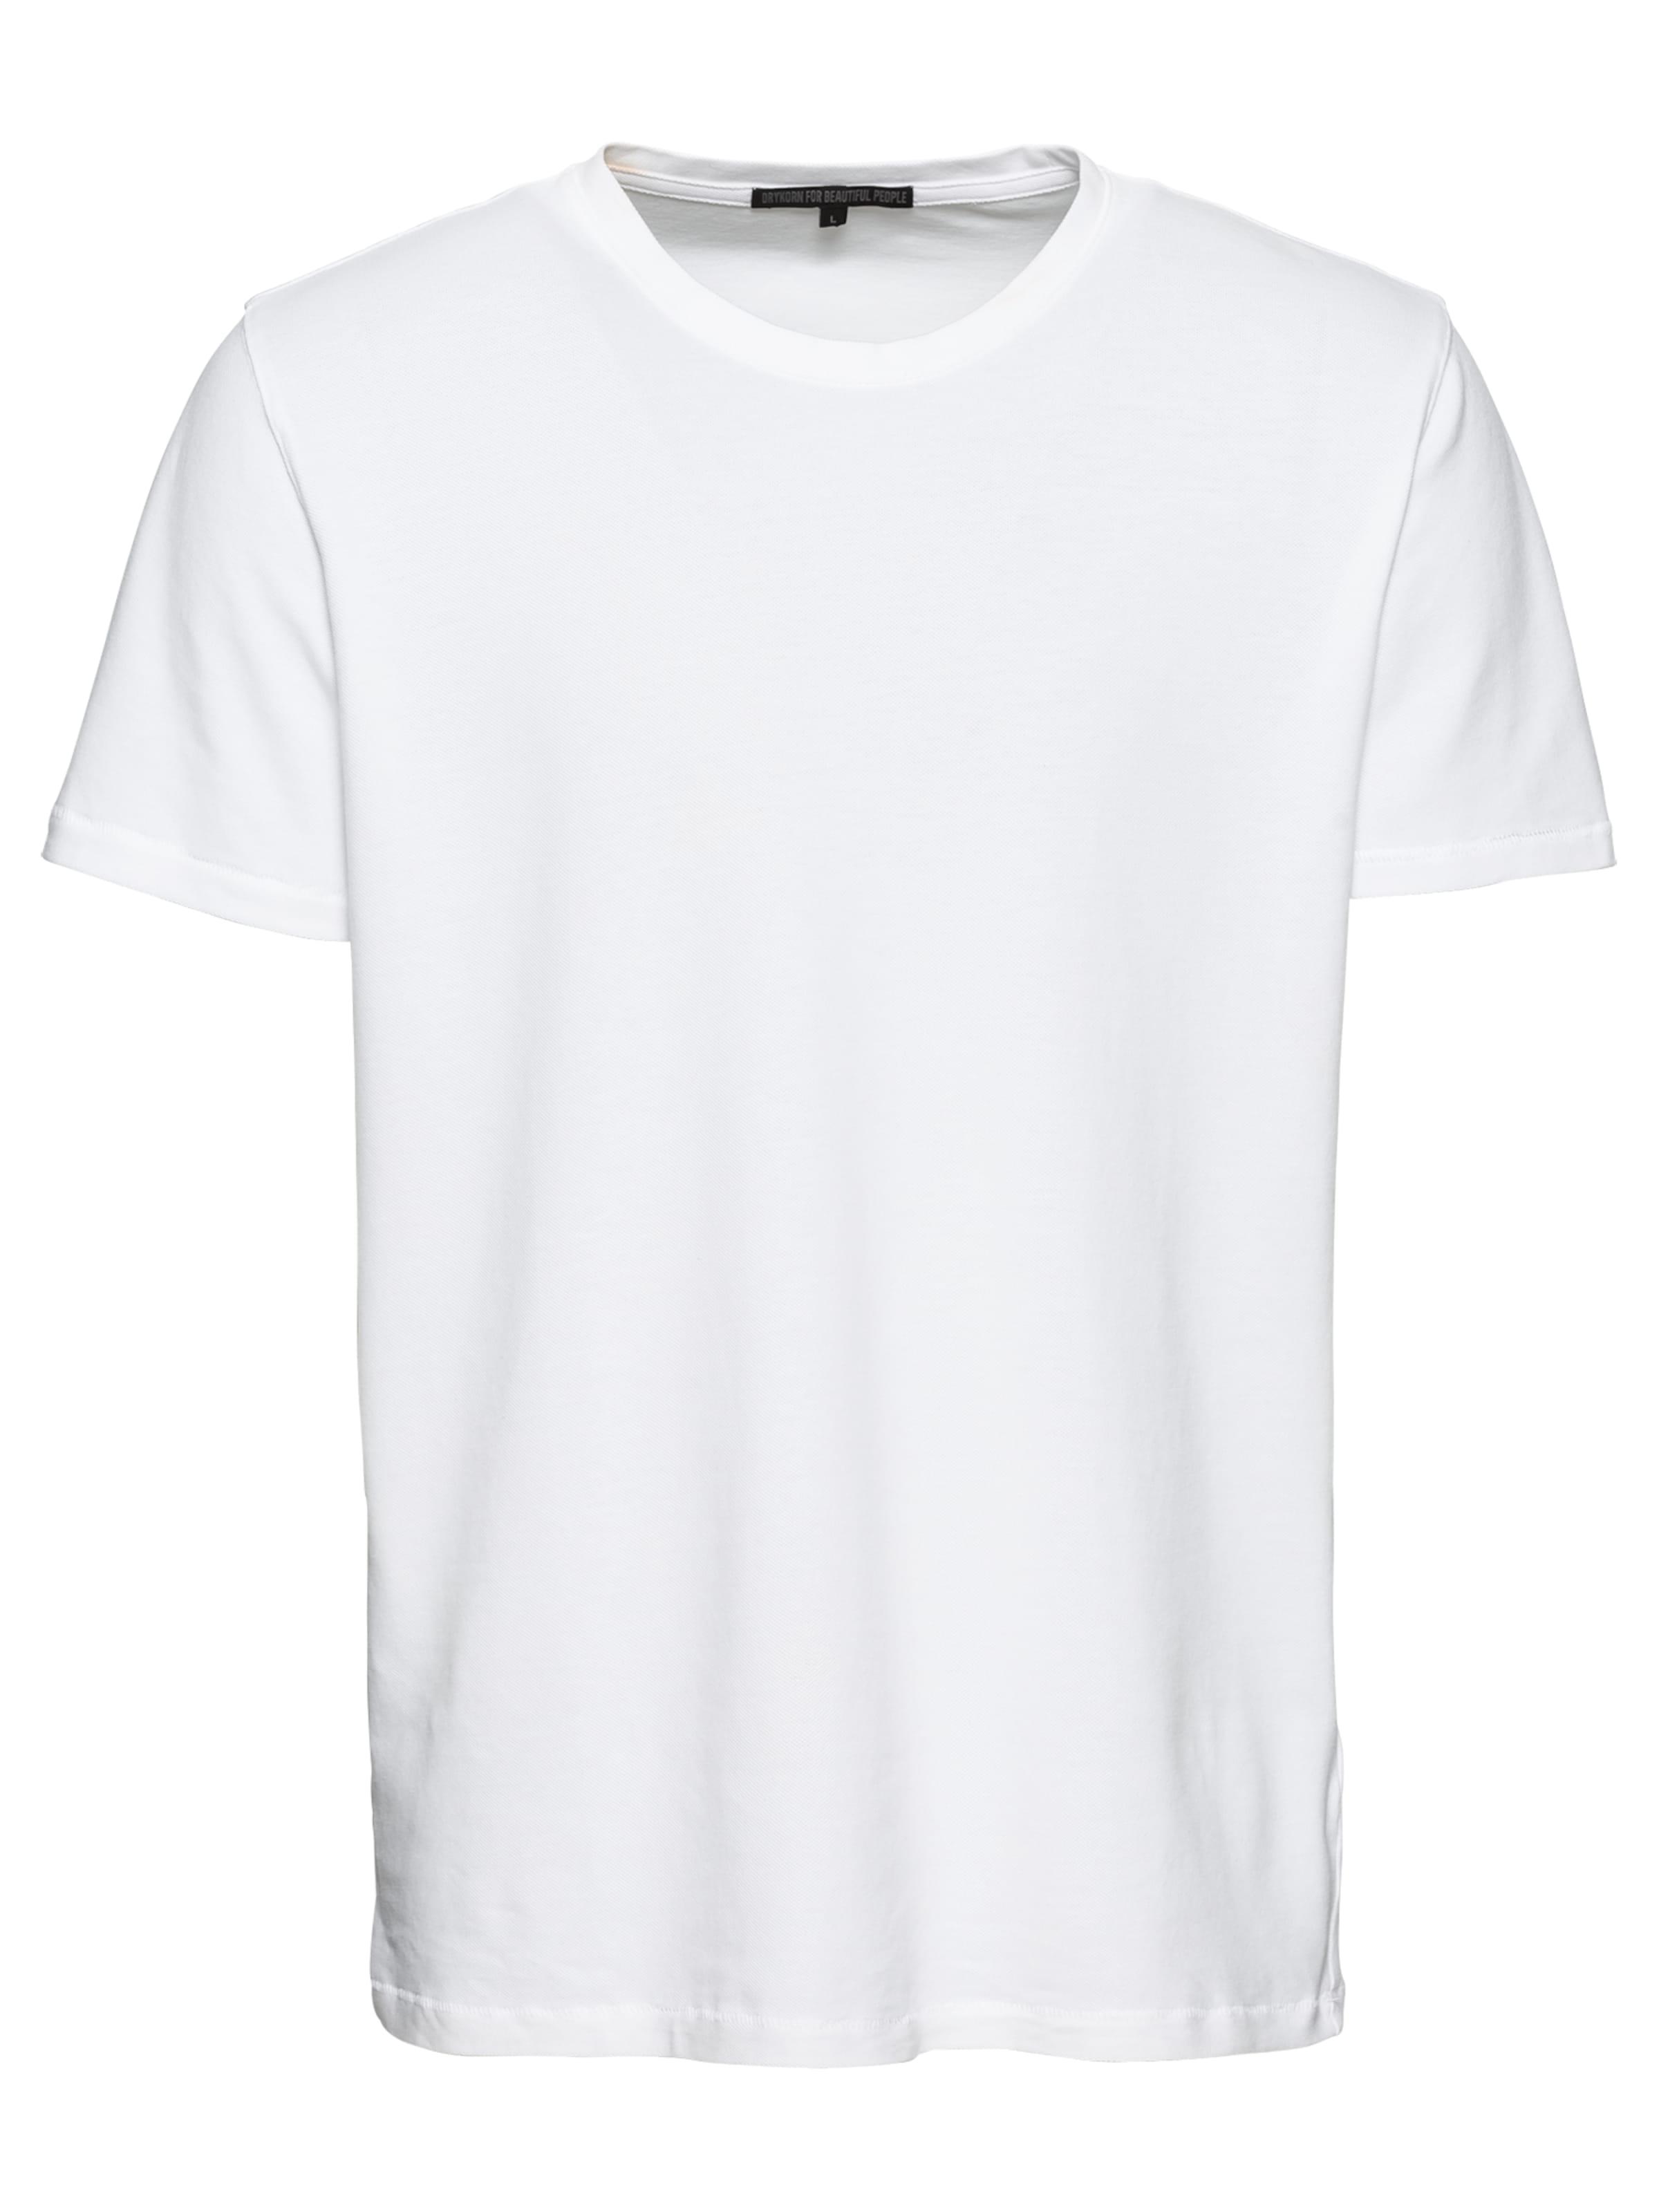 T shirt Drykorn Weiß 'samuel' En KJ5lFcuT13